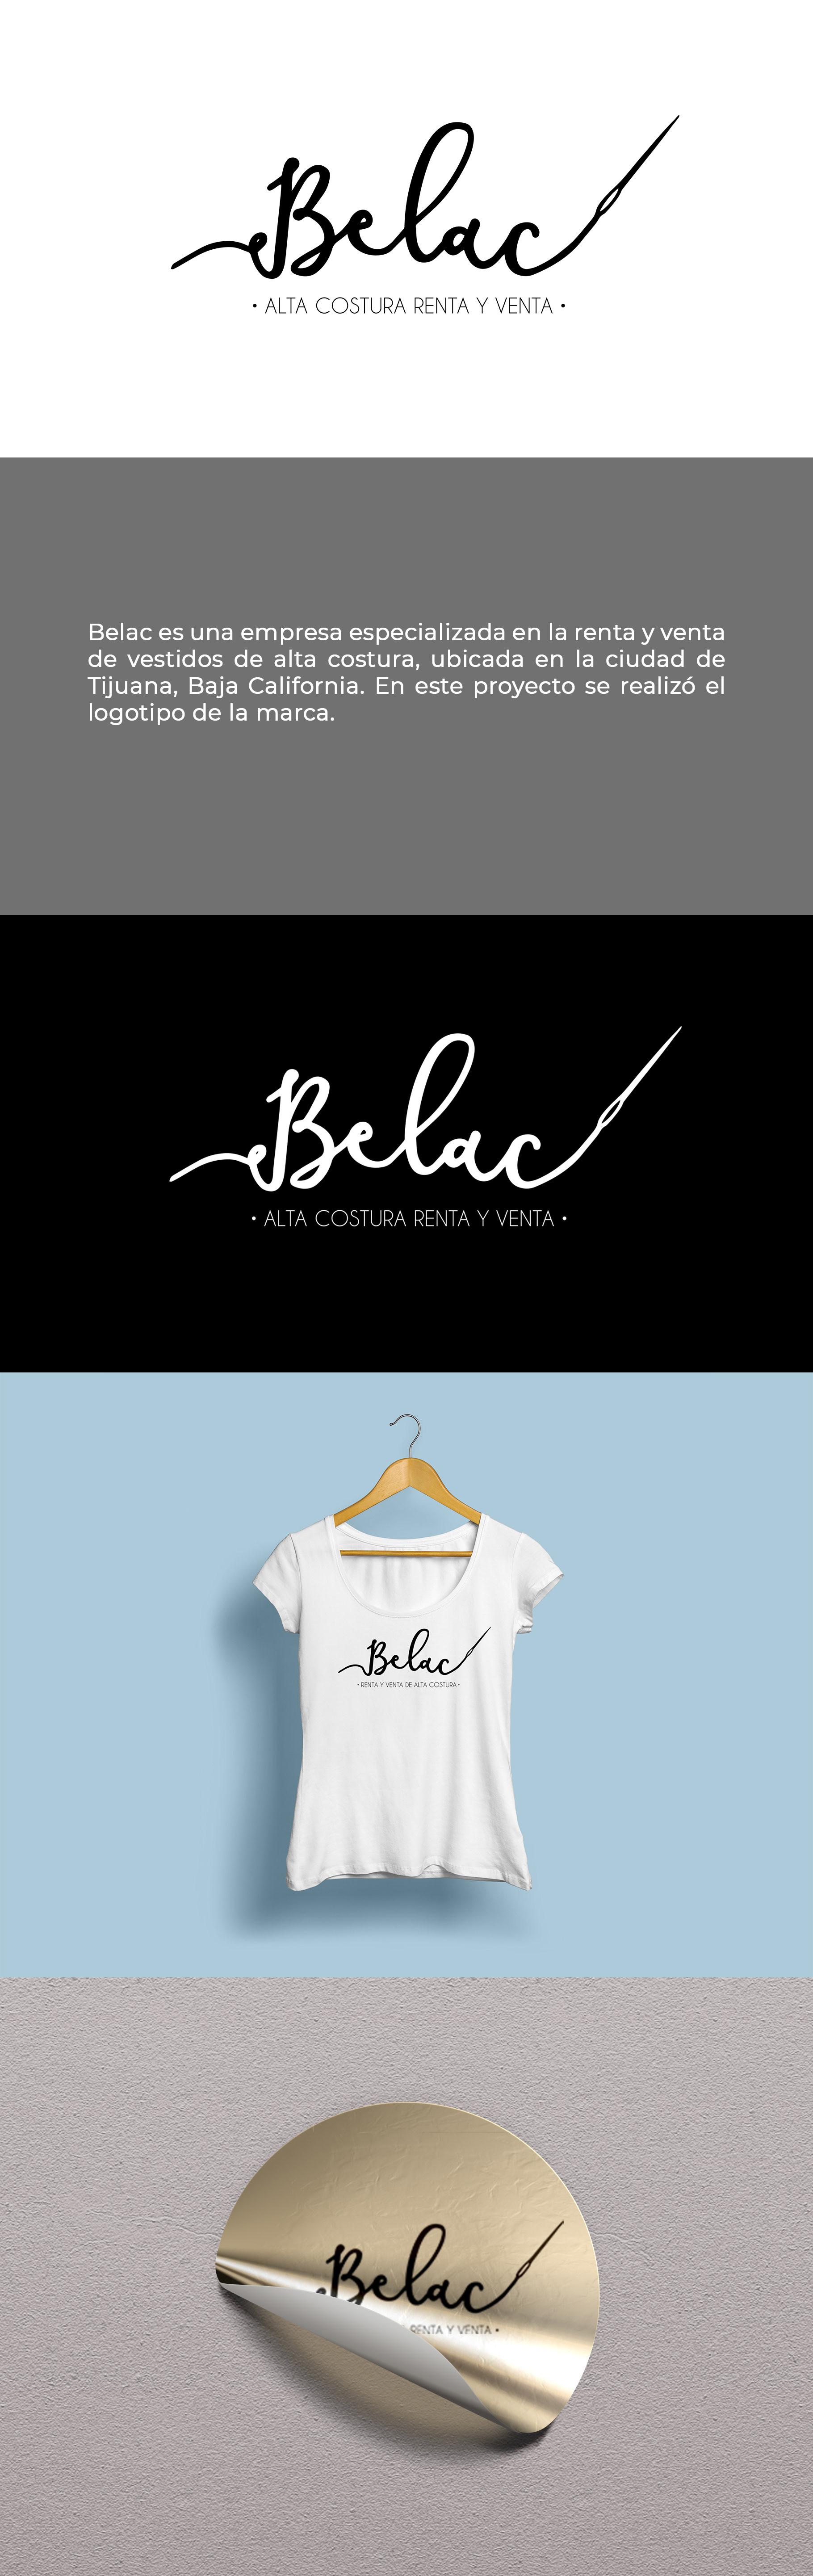 842d12552 BELAC on Behance